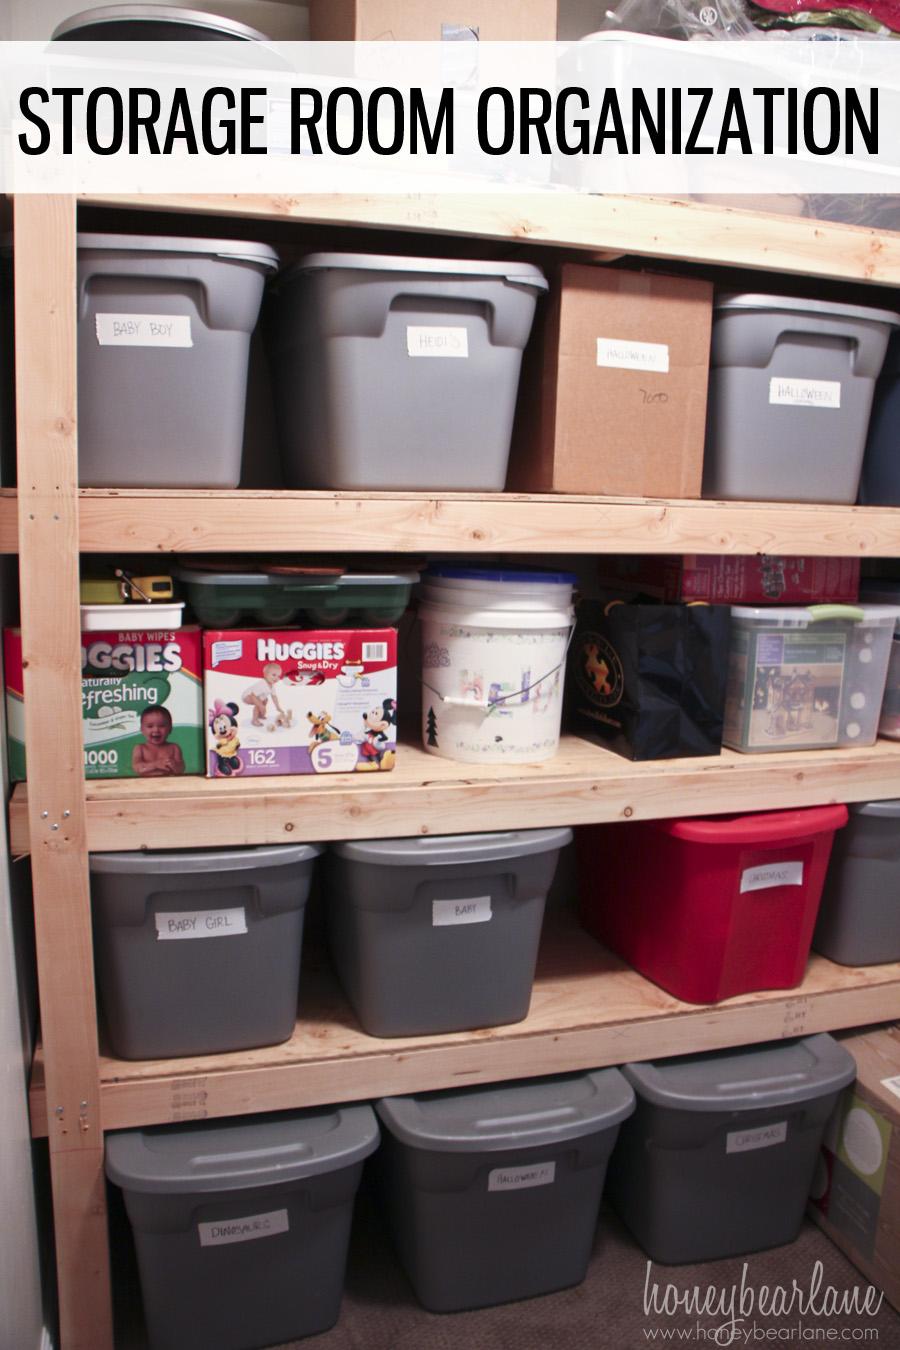 Storage Room Organization Honeybear Lane